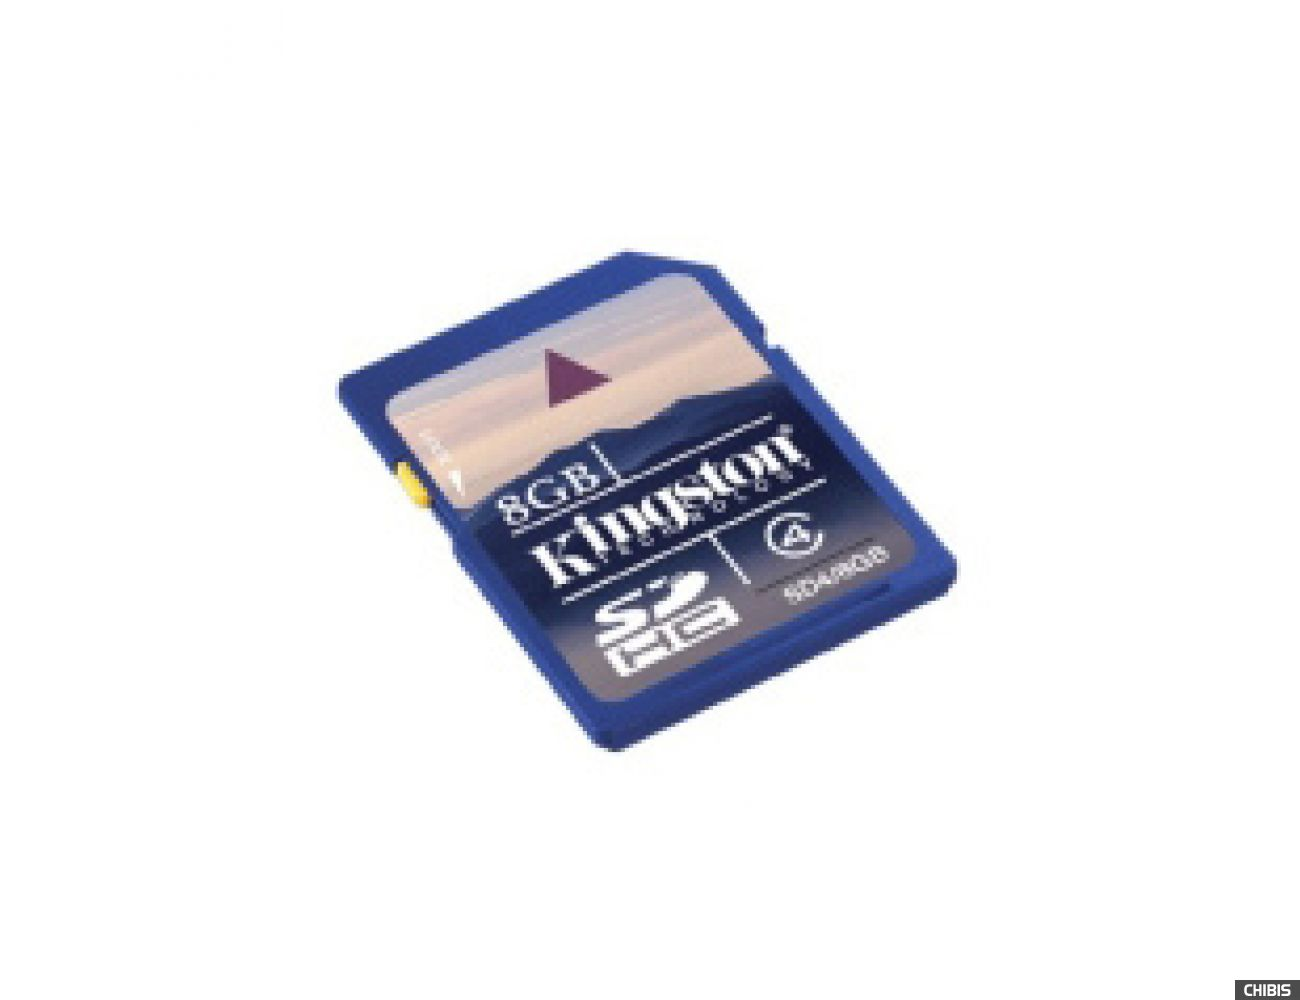 Карта памяти Kingston Secure Digital High-Capacity (SDHC) Class 4 8Gb